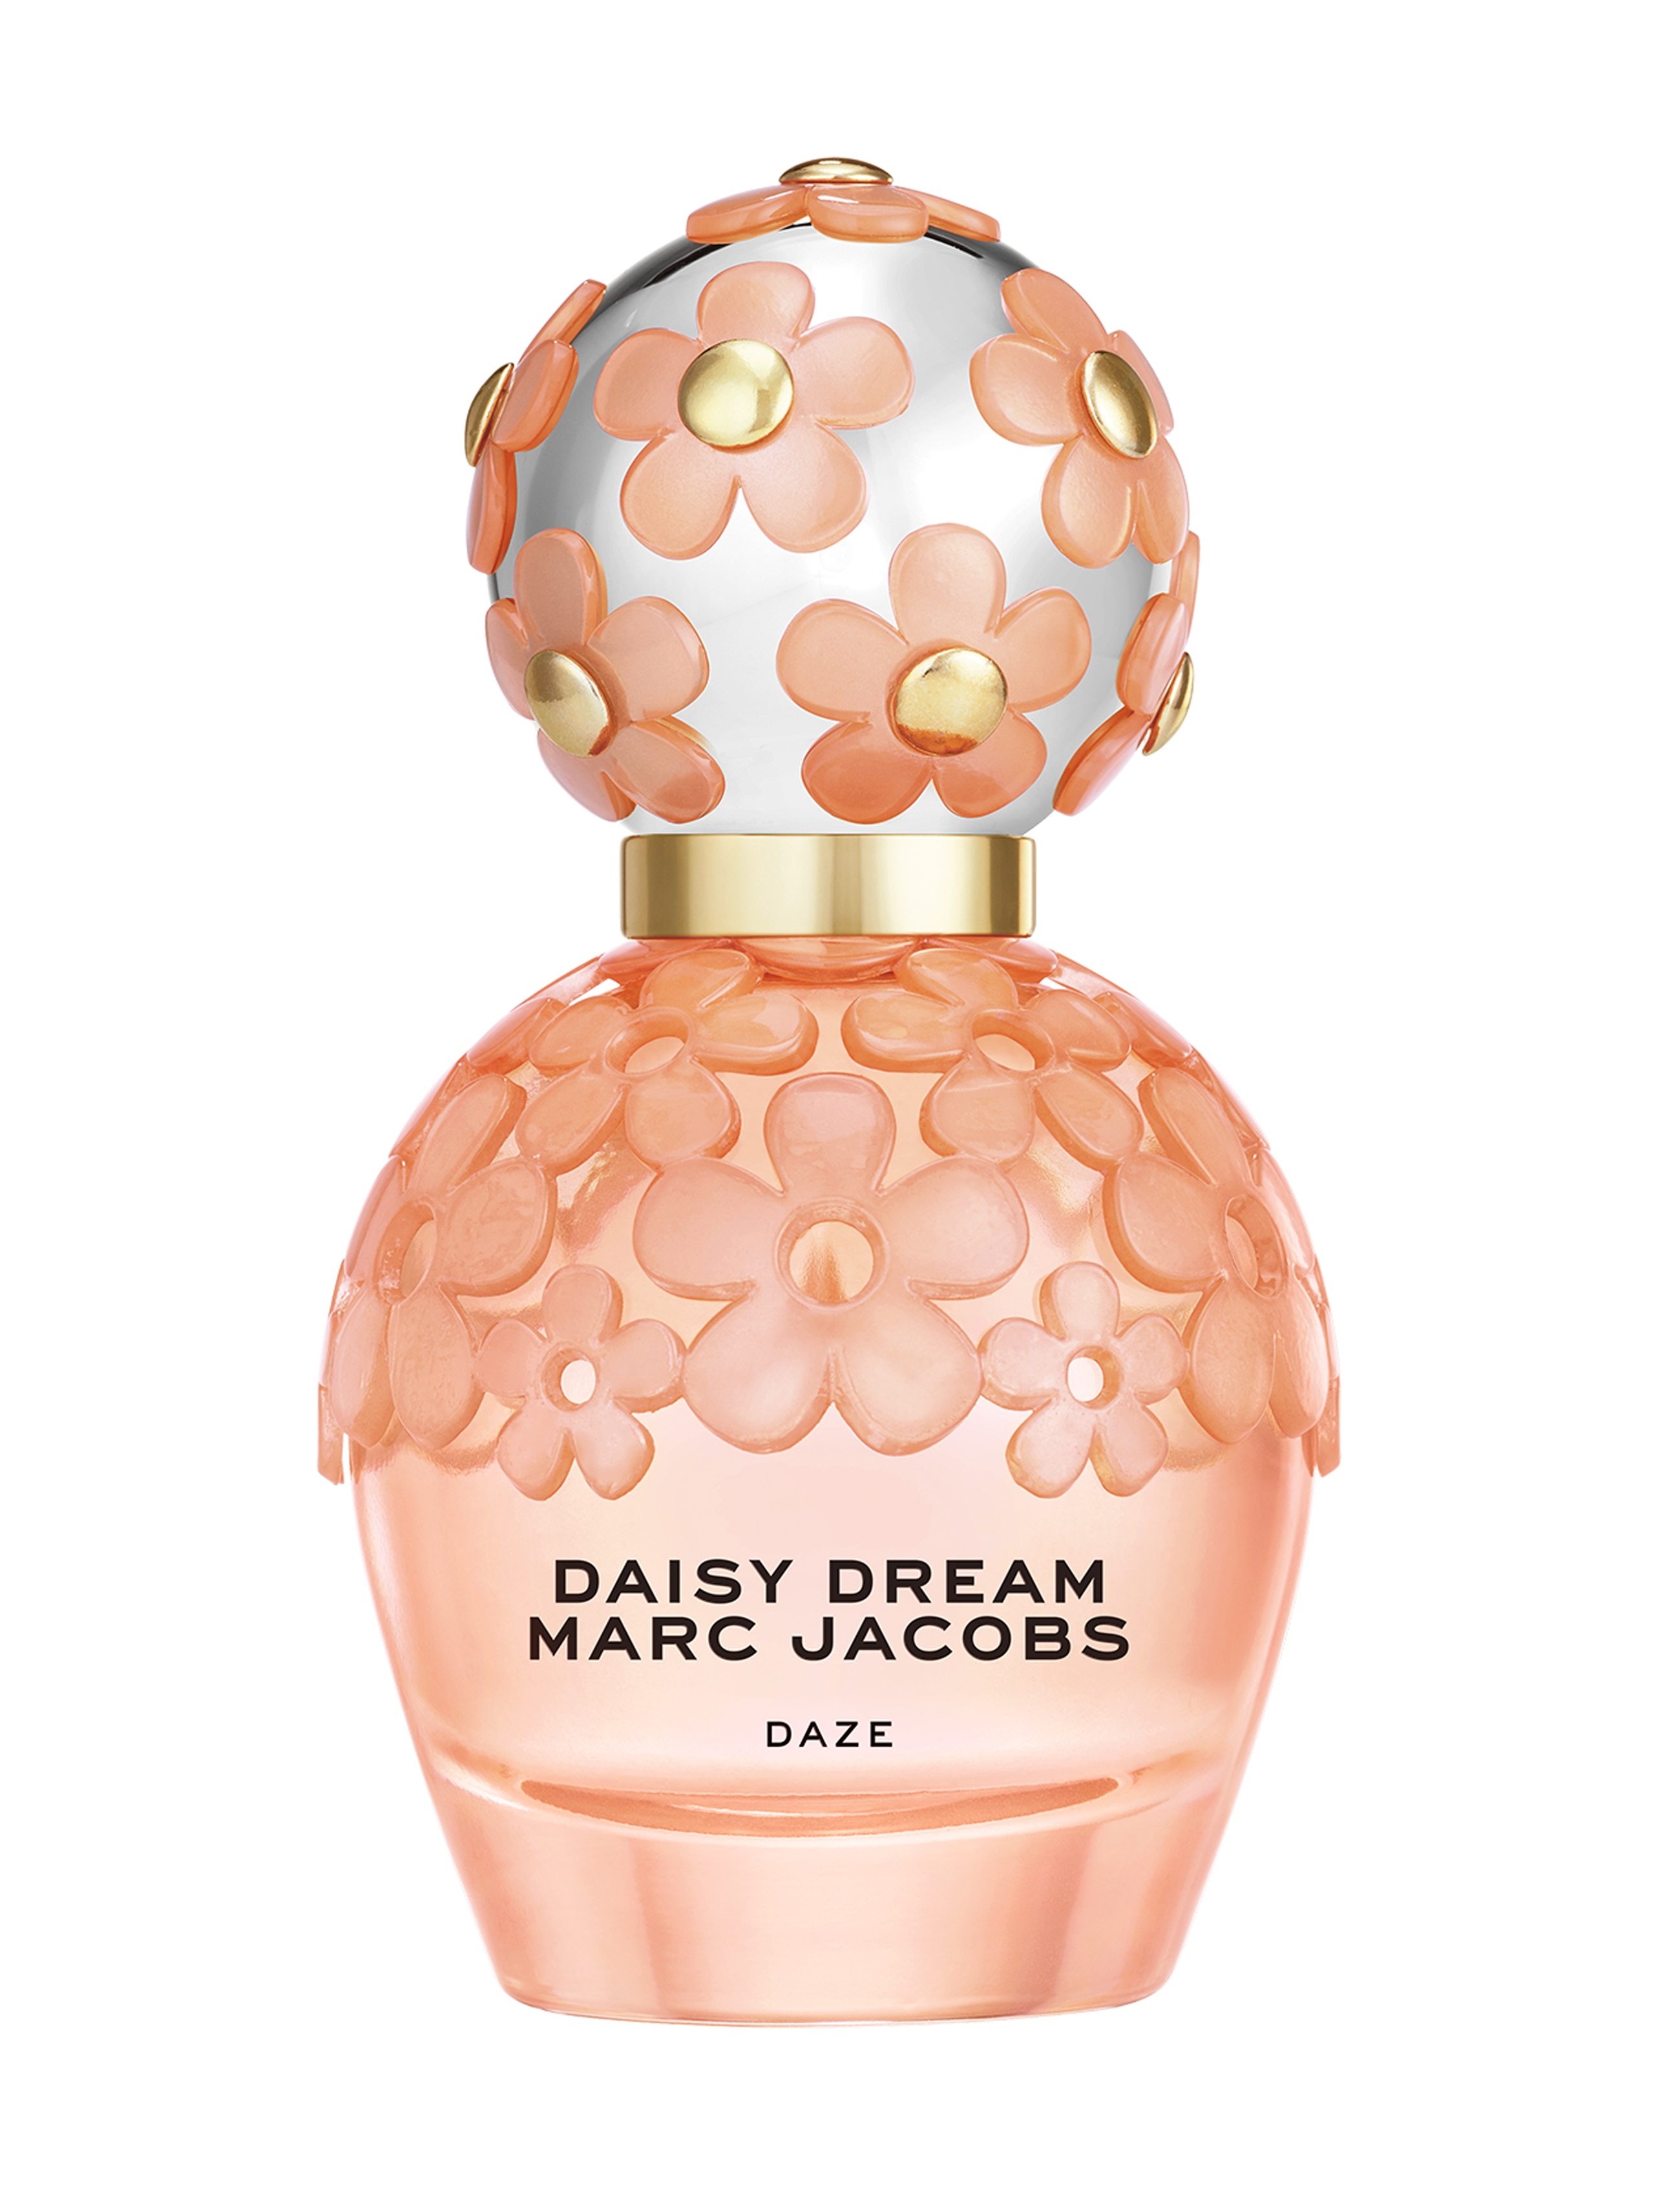 Marc Jacobs Daisy Dream Daze EDT